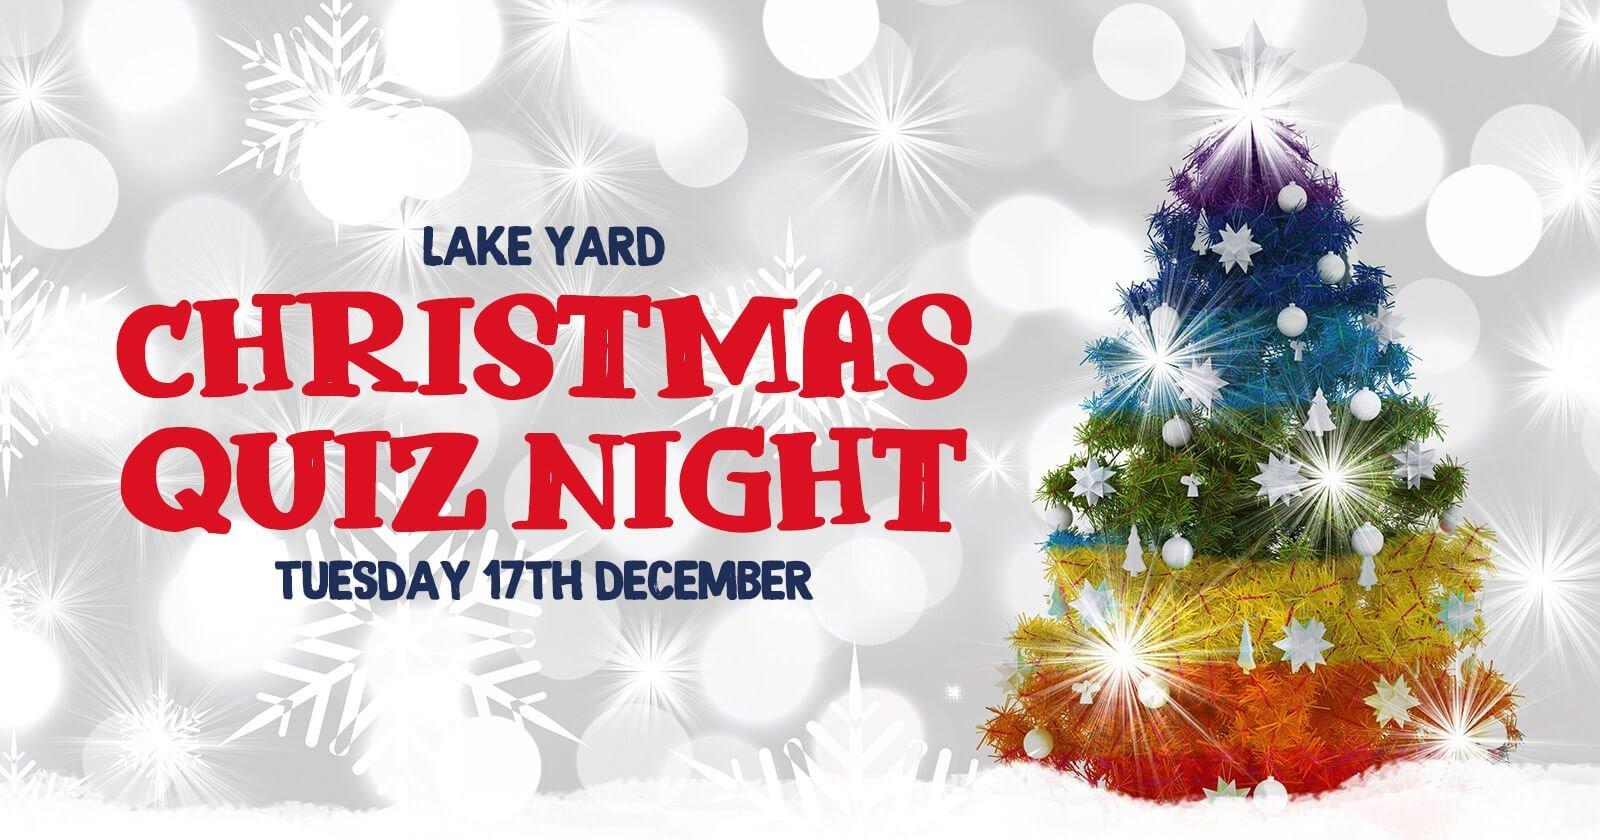 lake-yard-christmas-quiz-2019-2